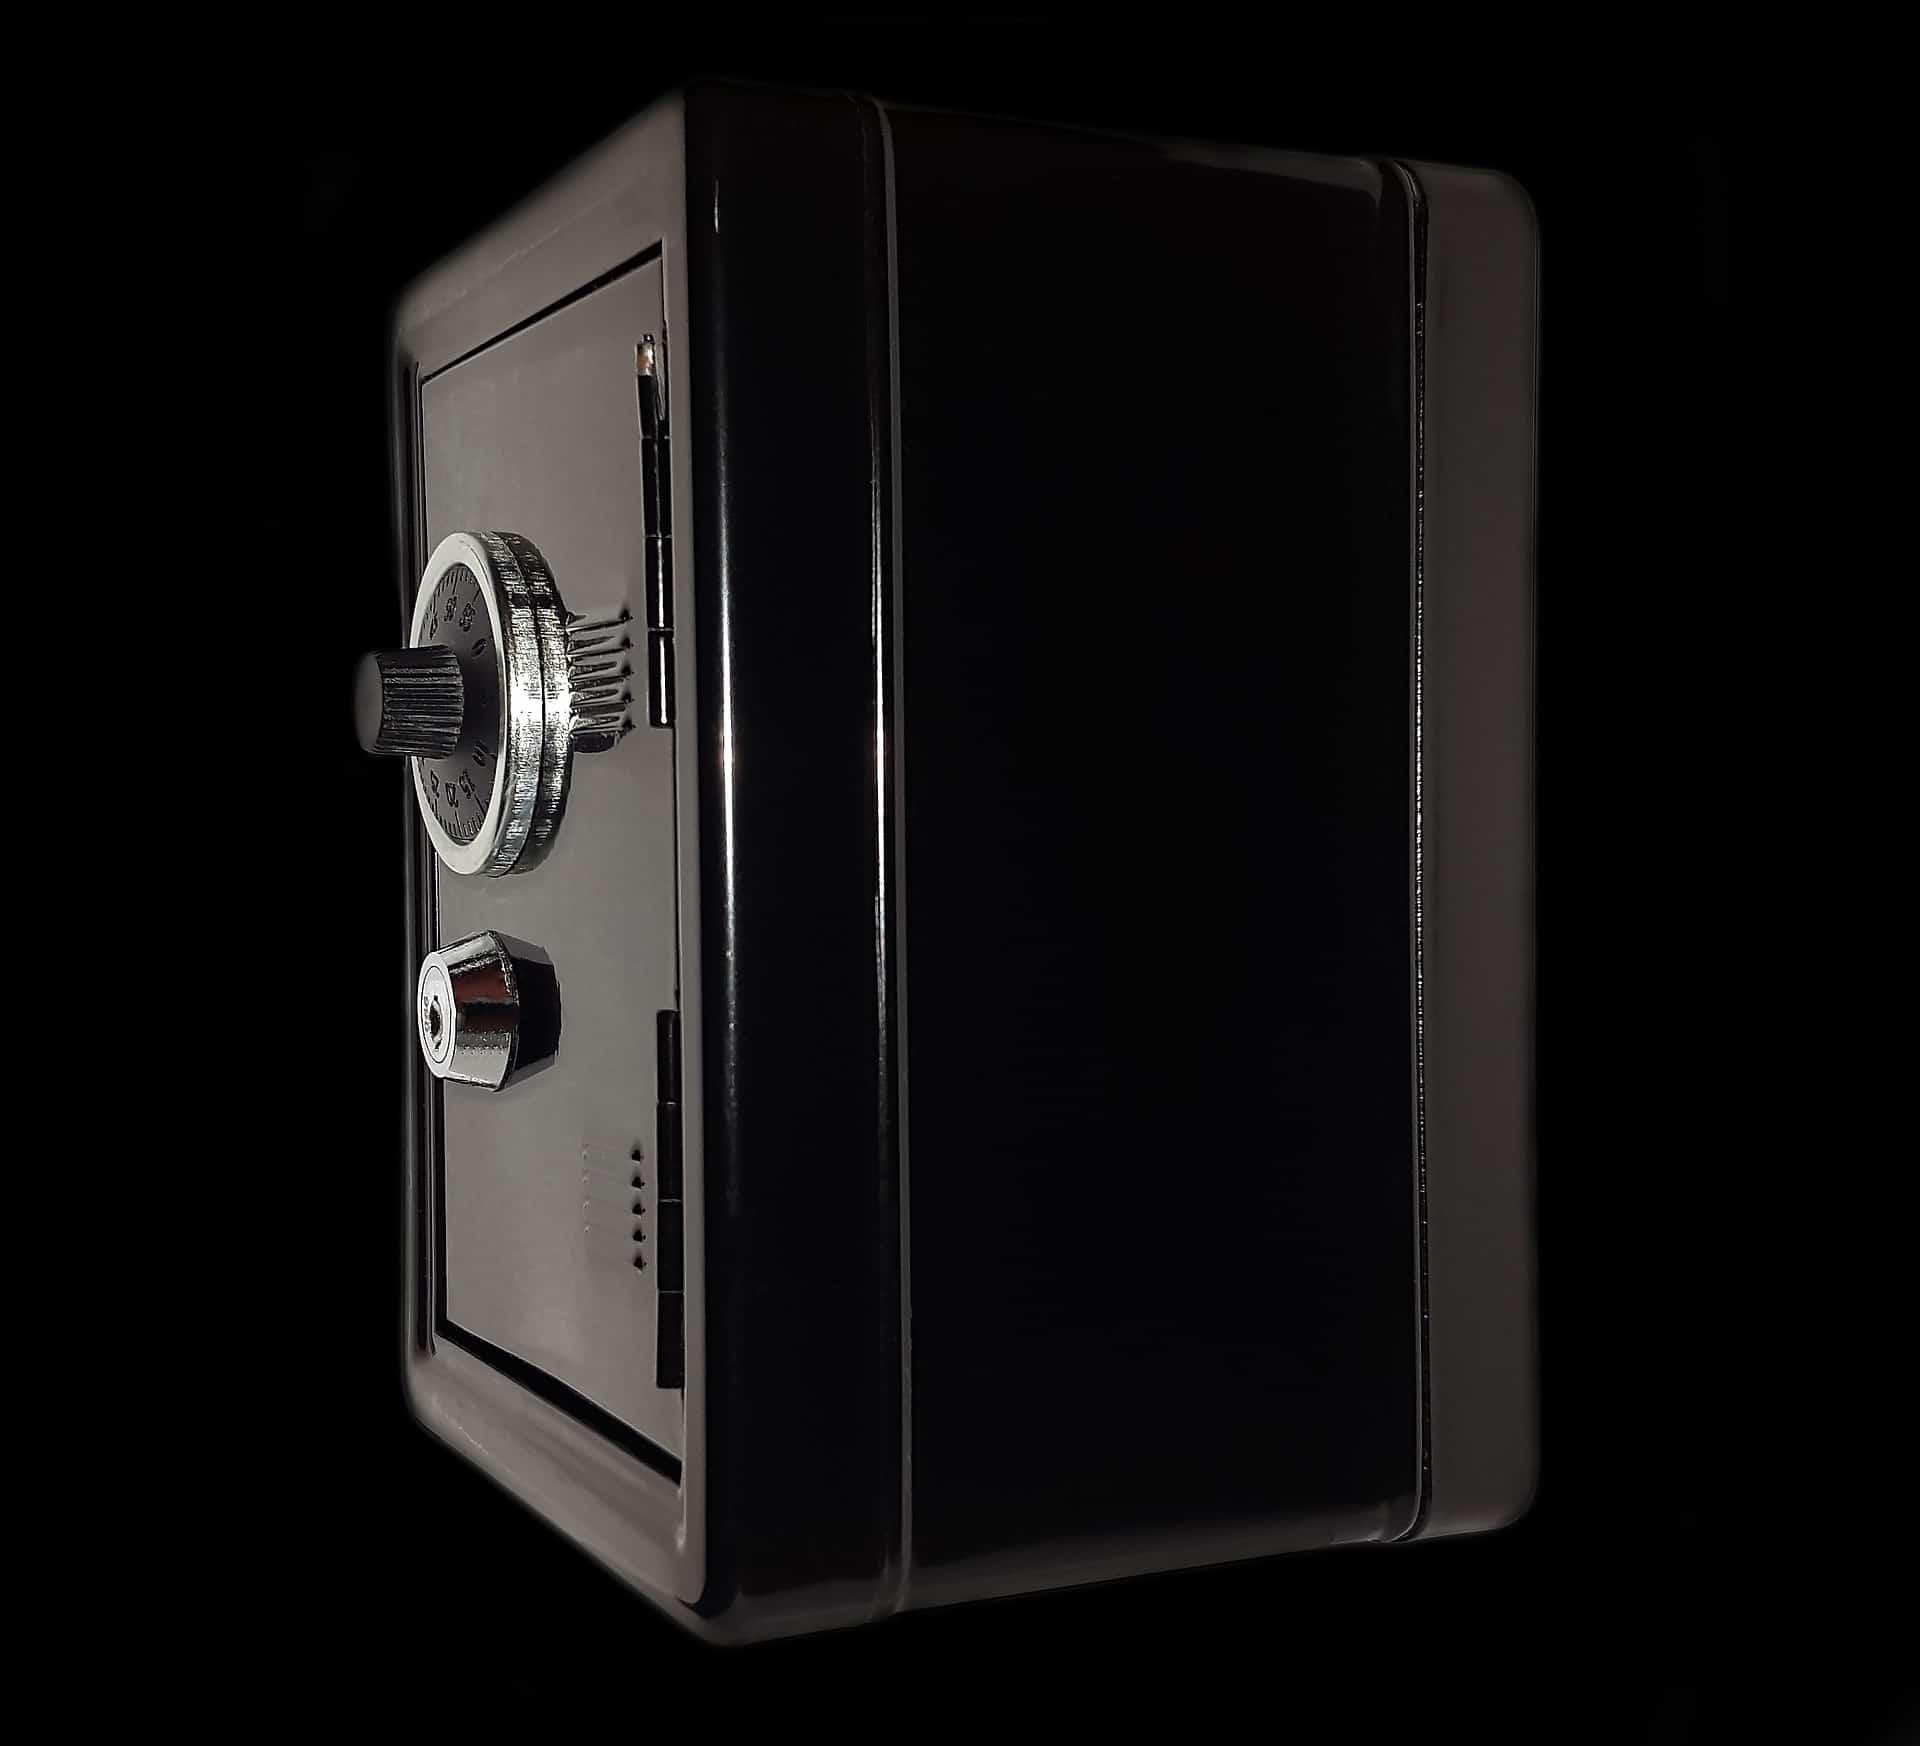 compare safes